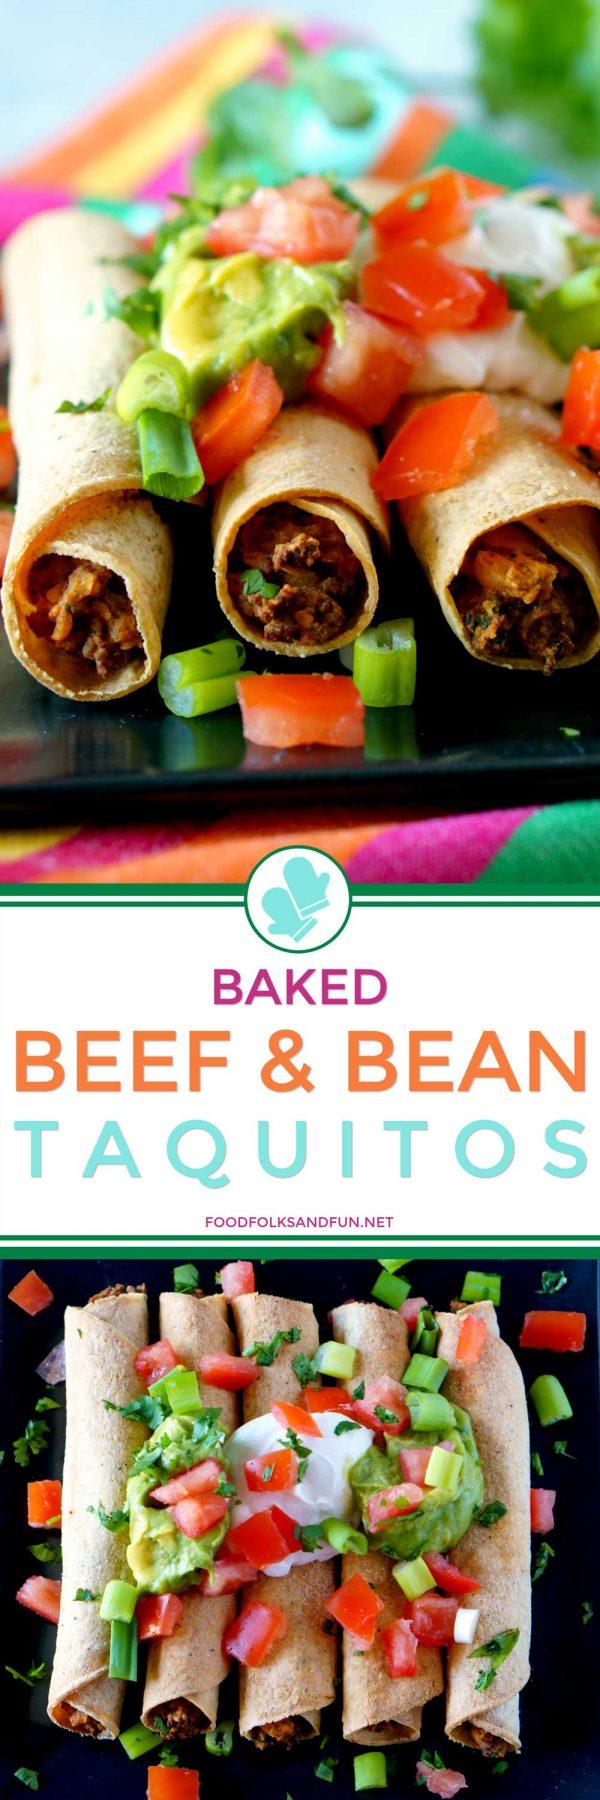 Freezer-friendly Beef Taquitos.